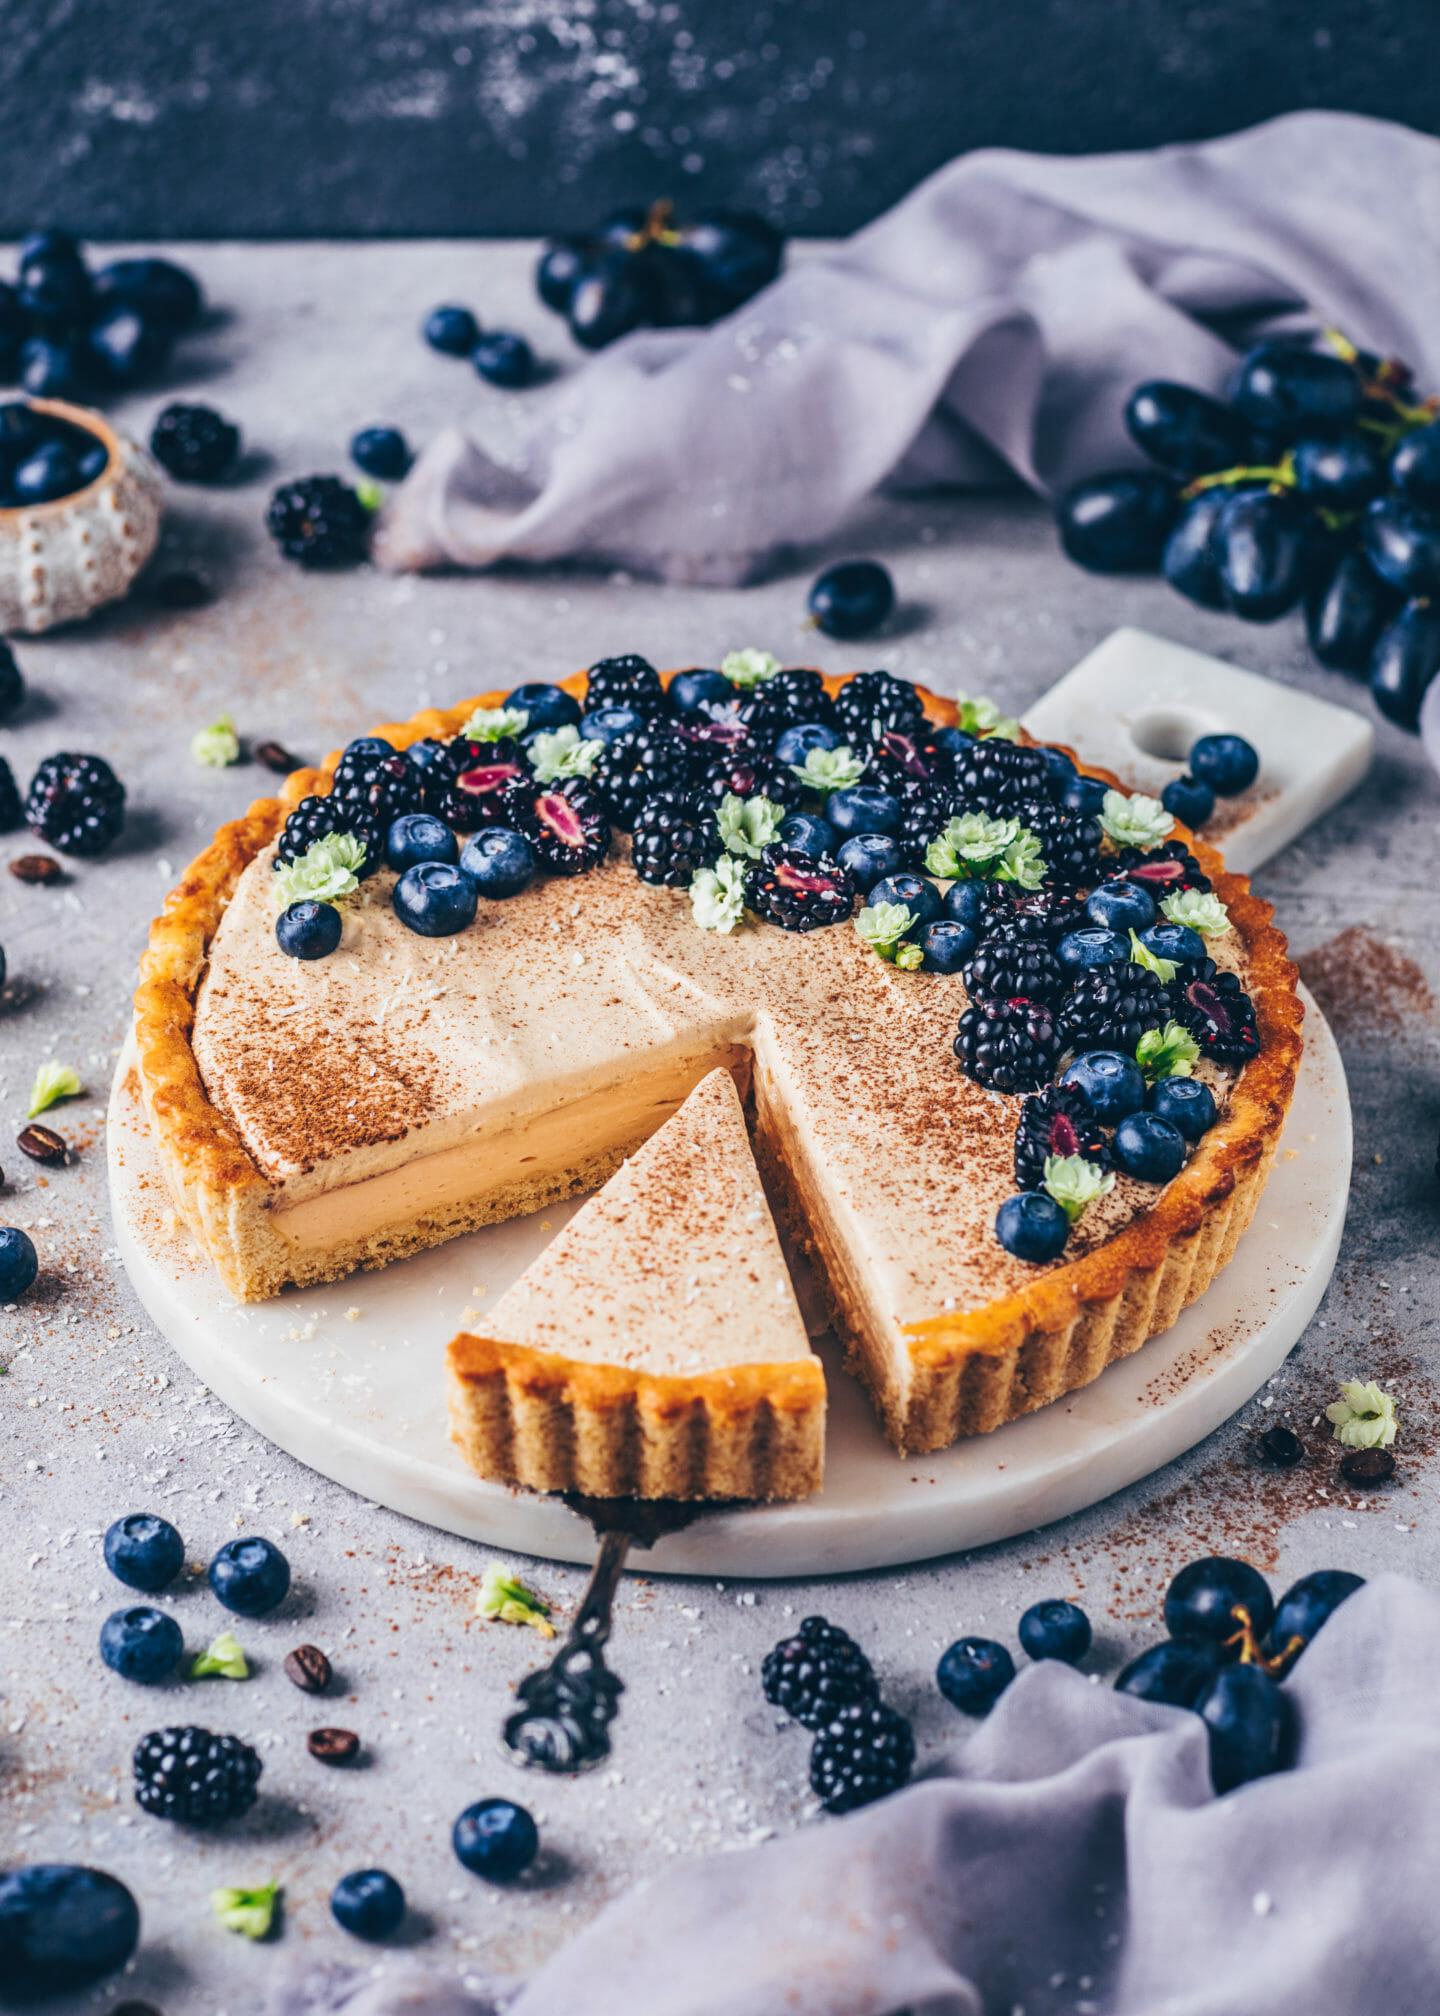 Vegan Milk Pudding Custard Tart with coffee mousse, blueberries and blackberries